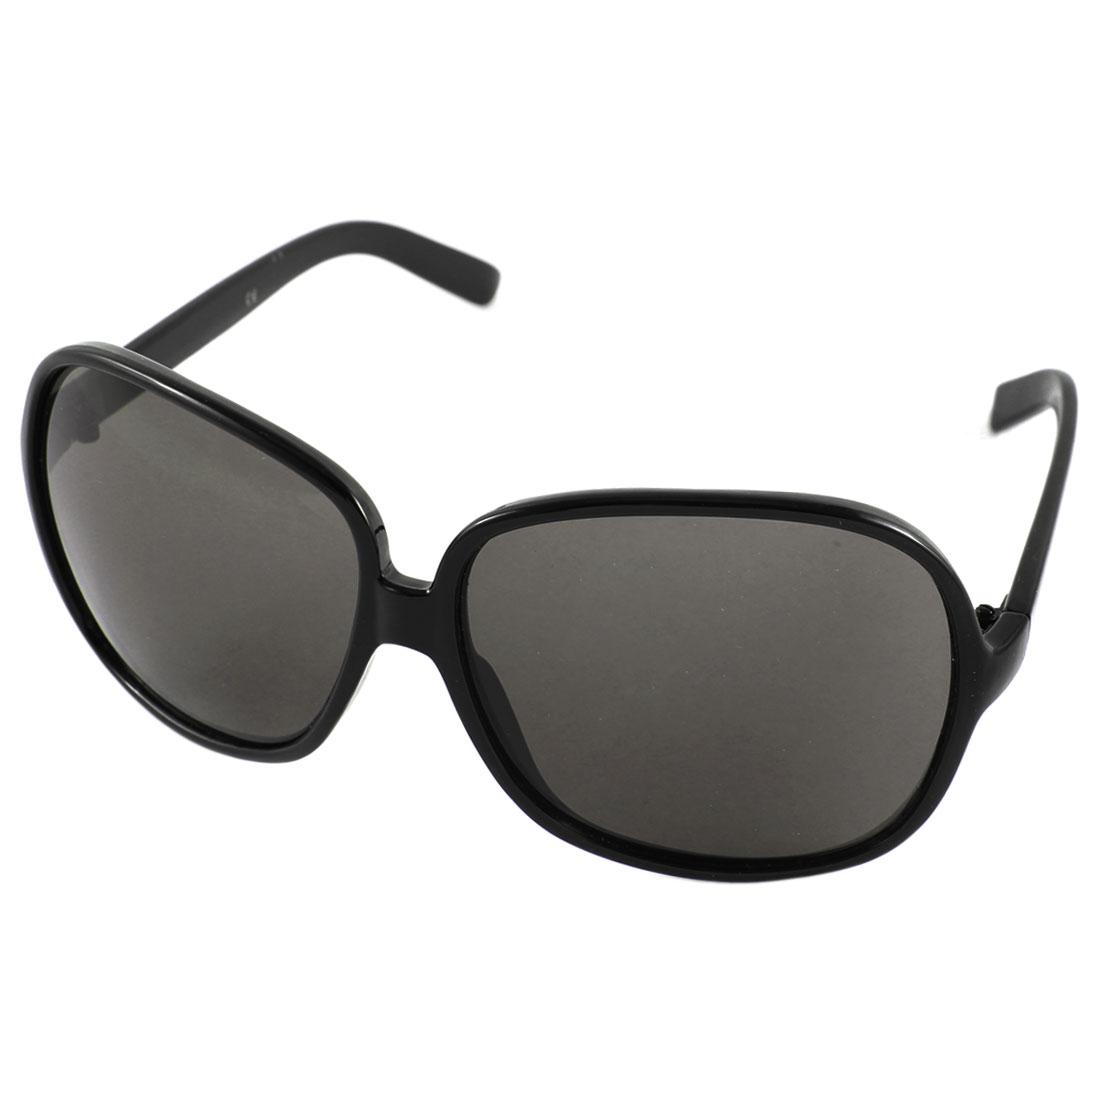 Unisex Full Rim Slim Temple Sun Protective Eyewear Sunglasses Black